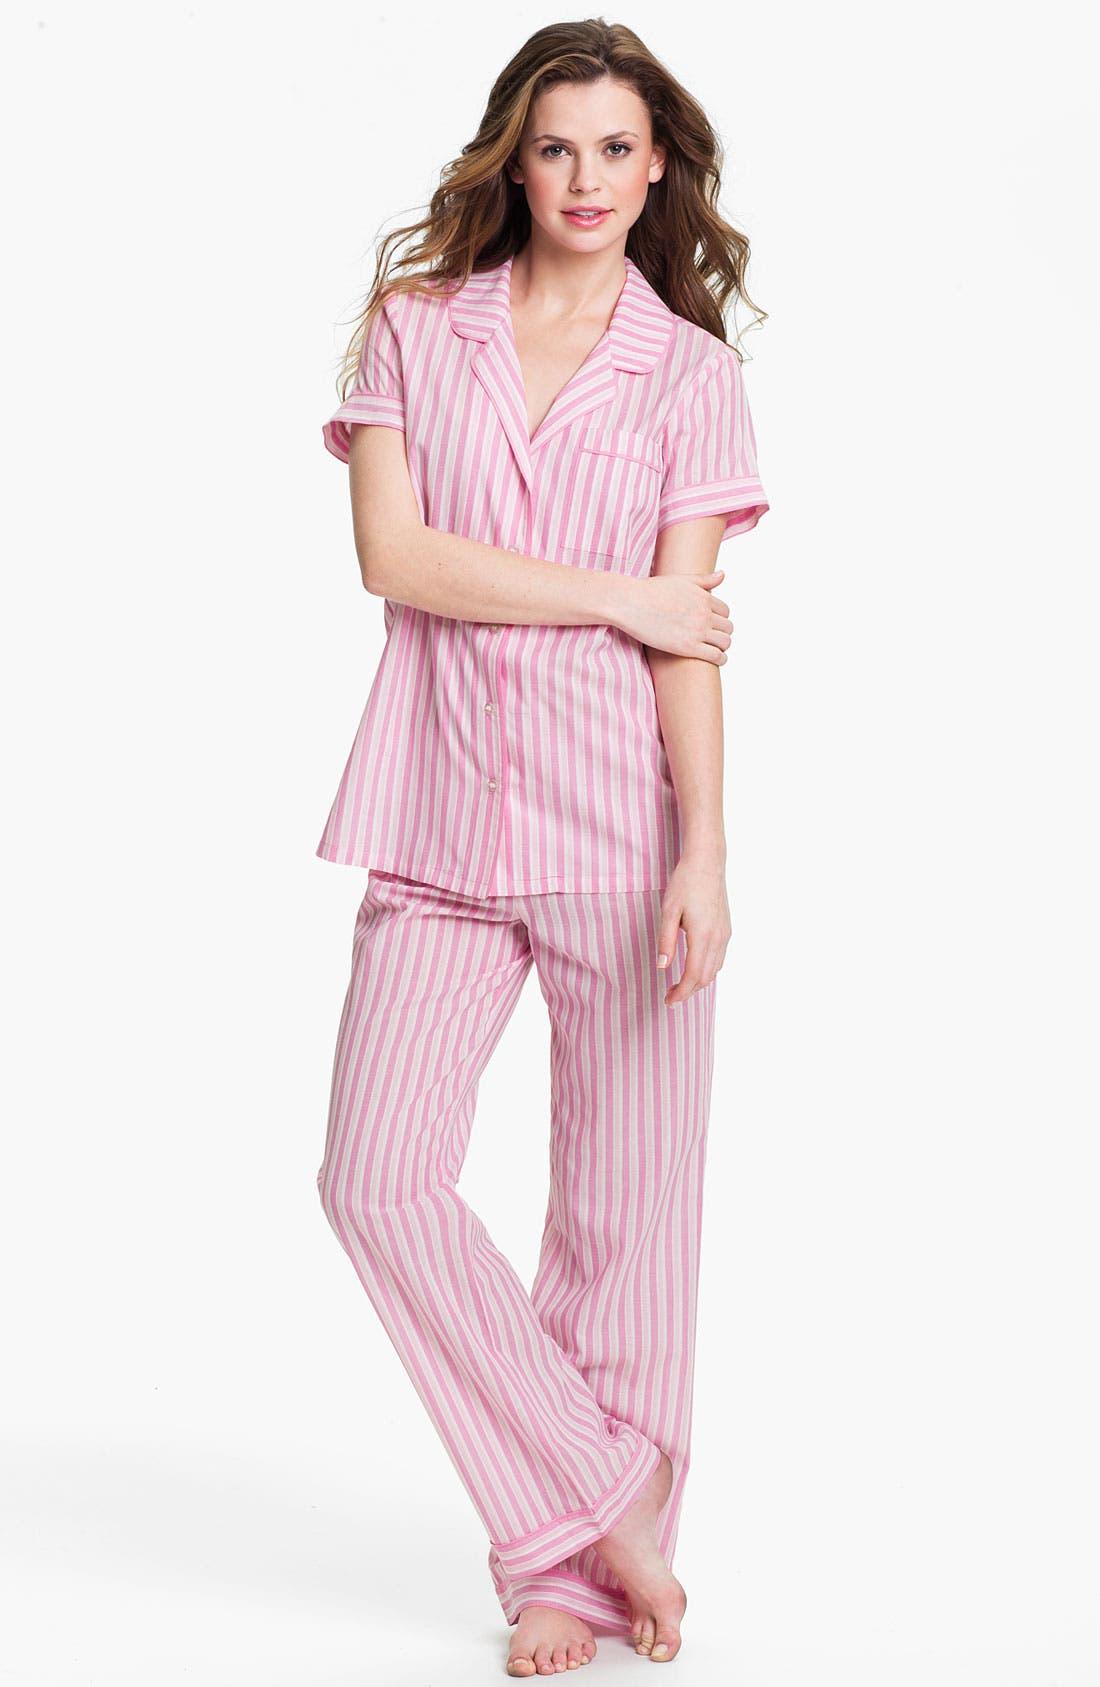 Alternate Image 1 Selected - Nordstrom 'Picnic' Pajamas